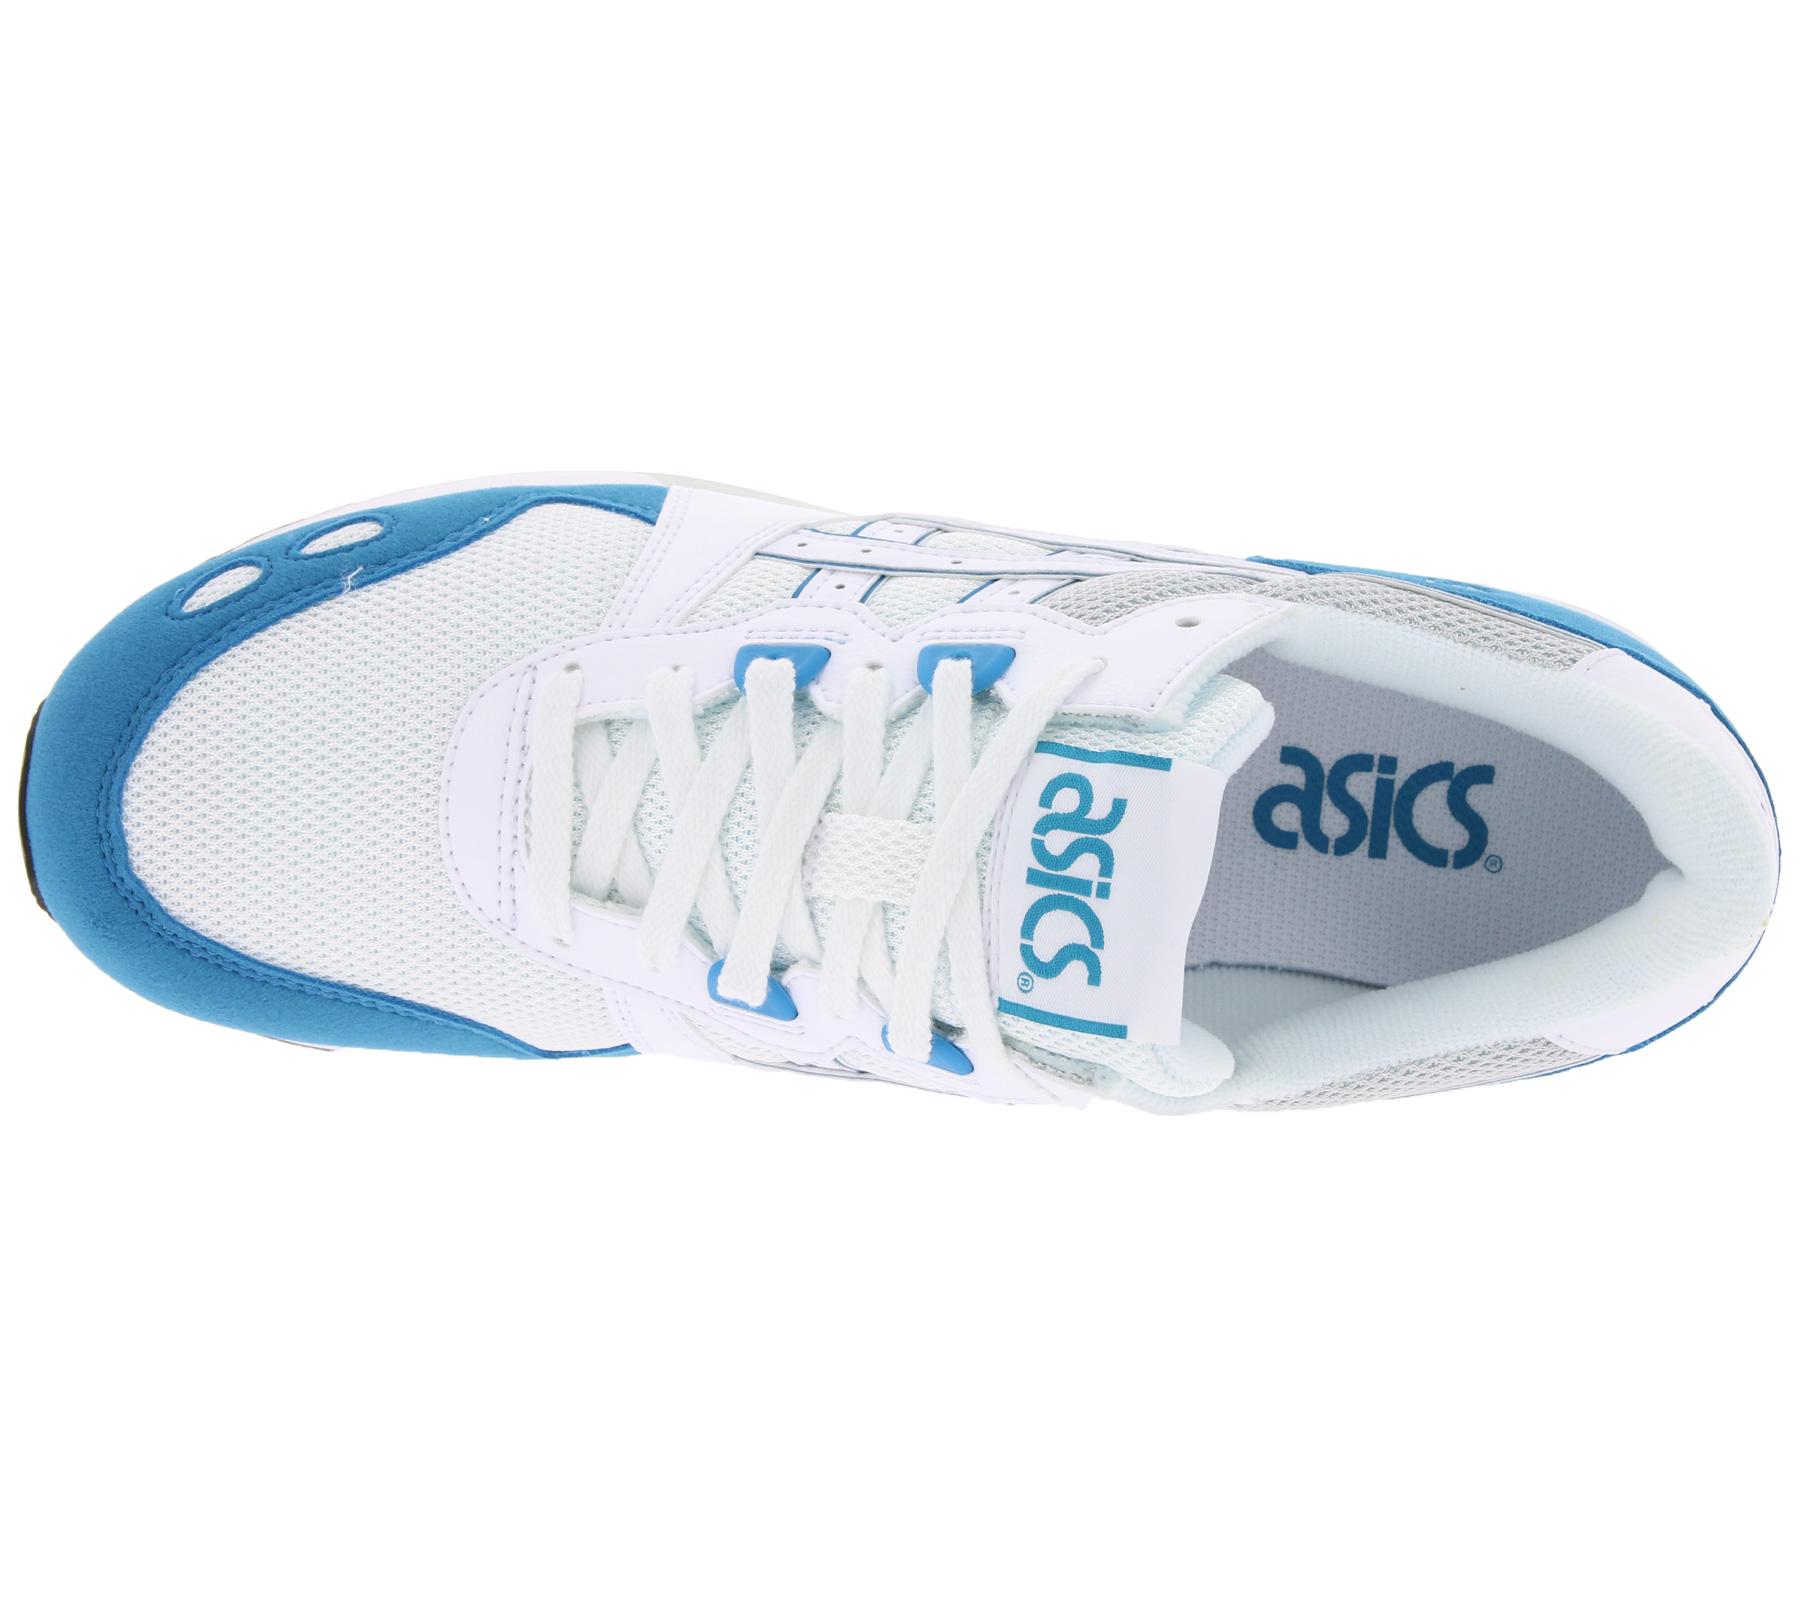 differently ca964 6c97f asics Schuhe trendige Sneaker Gel-Lyte Weiß/Blau